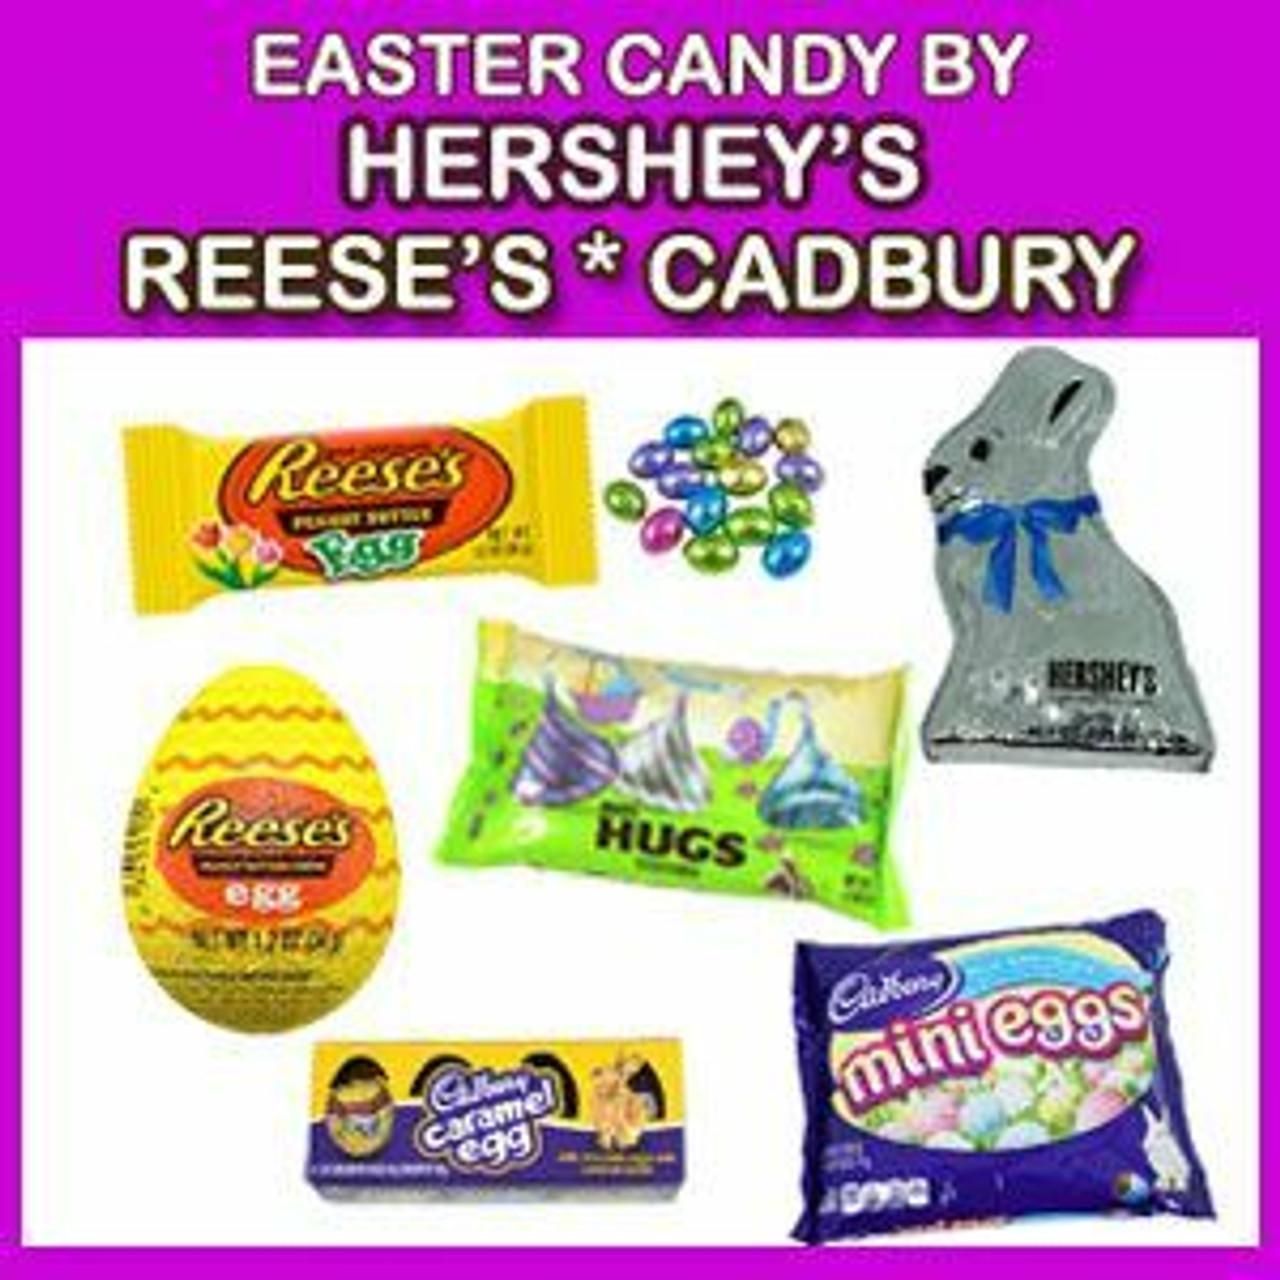 Hershey's, Reese's, Cadbury Easter Candy